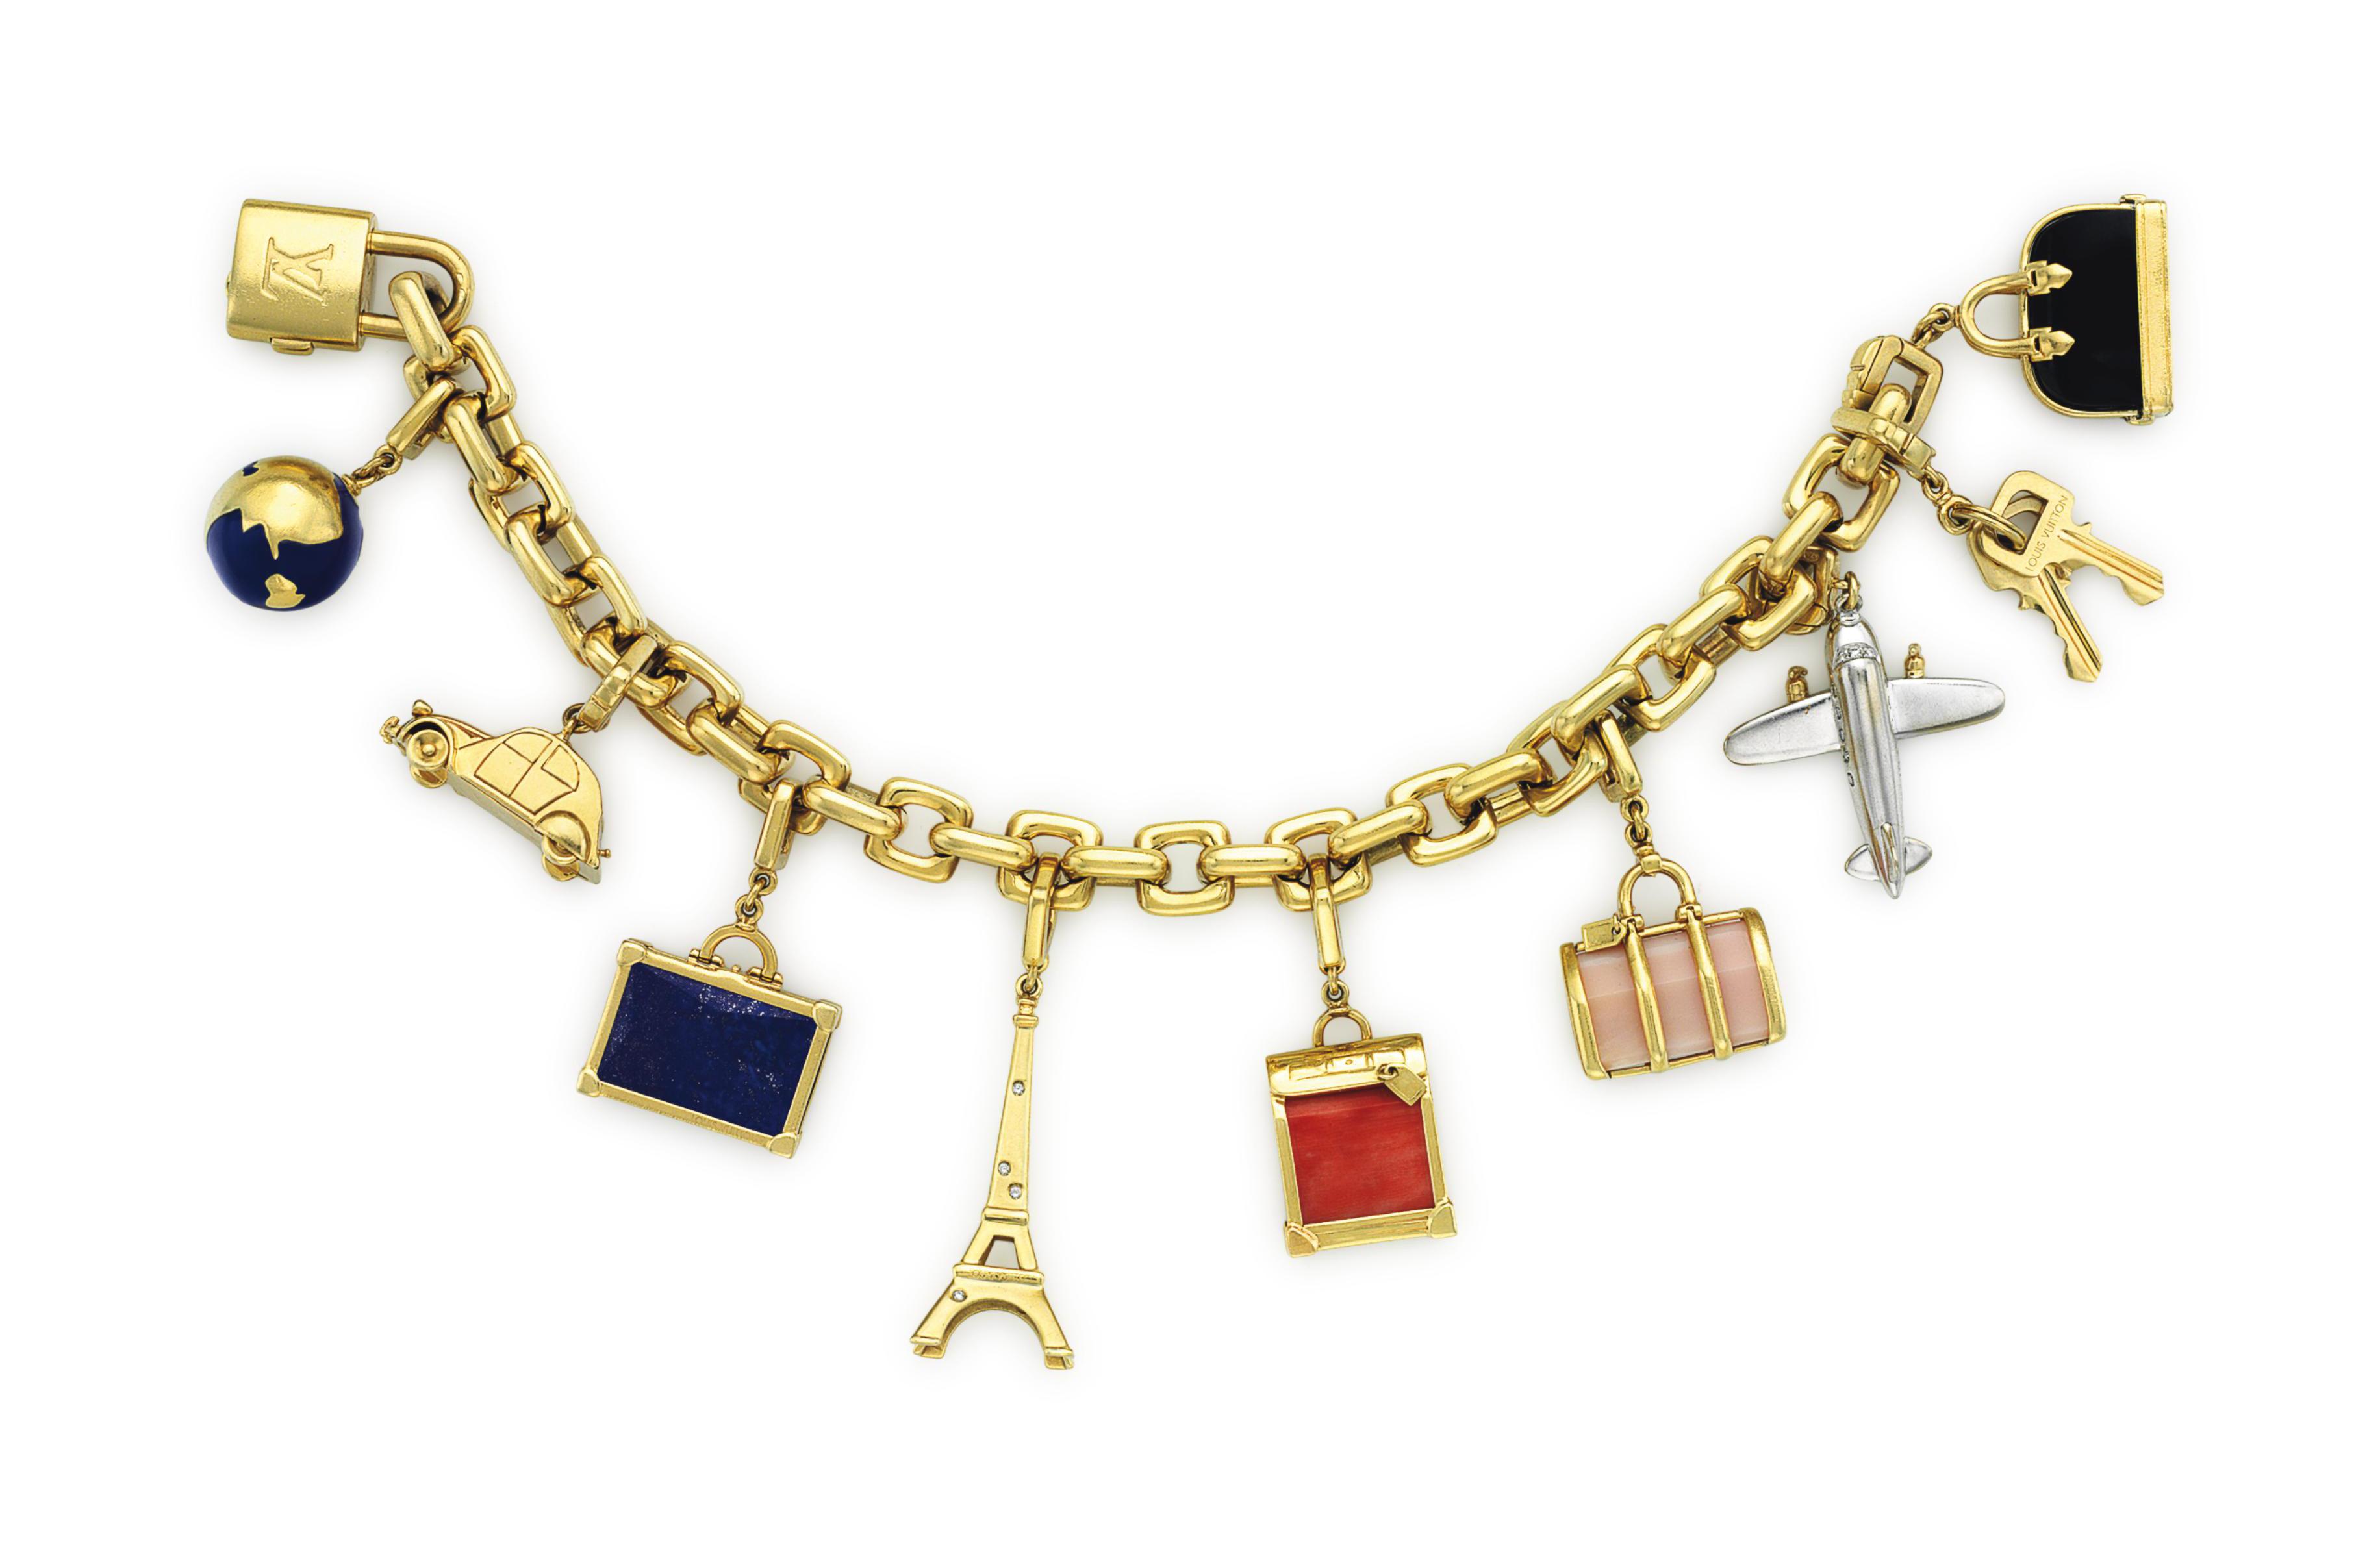 A MULTI-GEM, DIAMOND AND GOLD